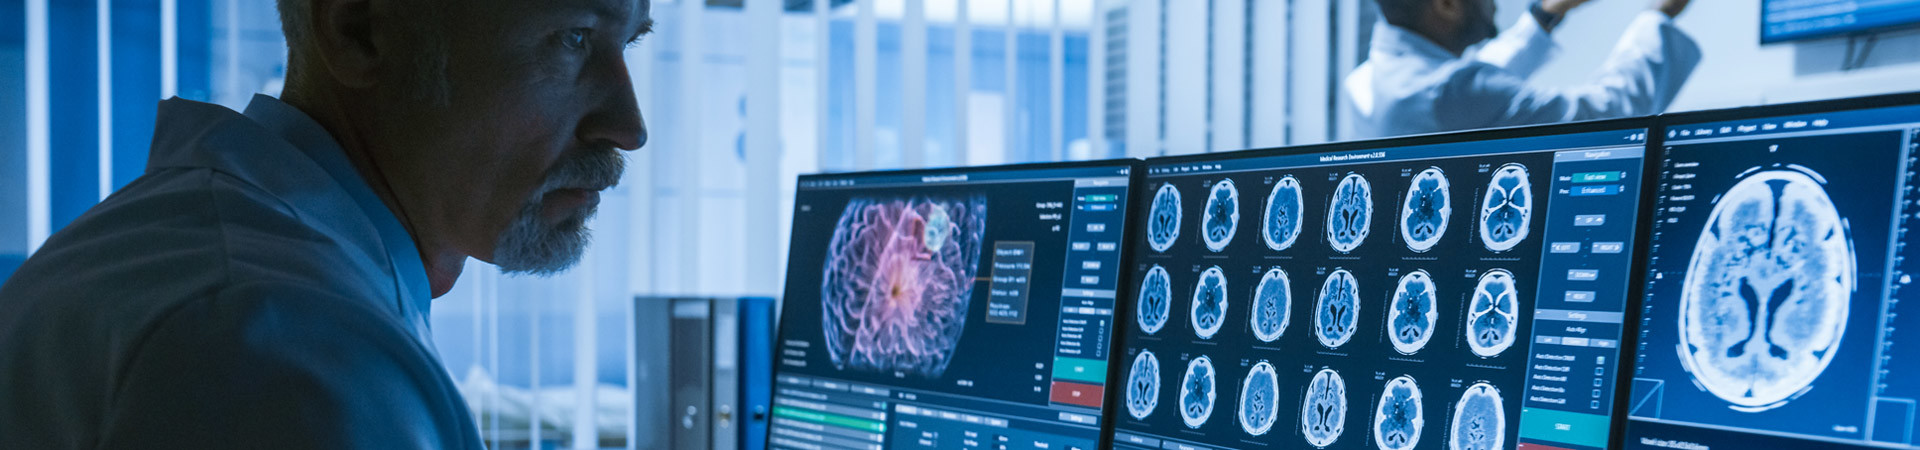 Teleradiology and teleheath solutions